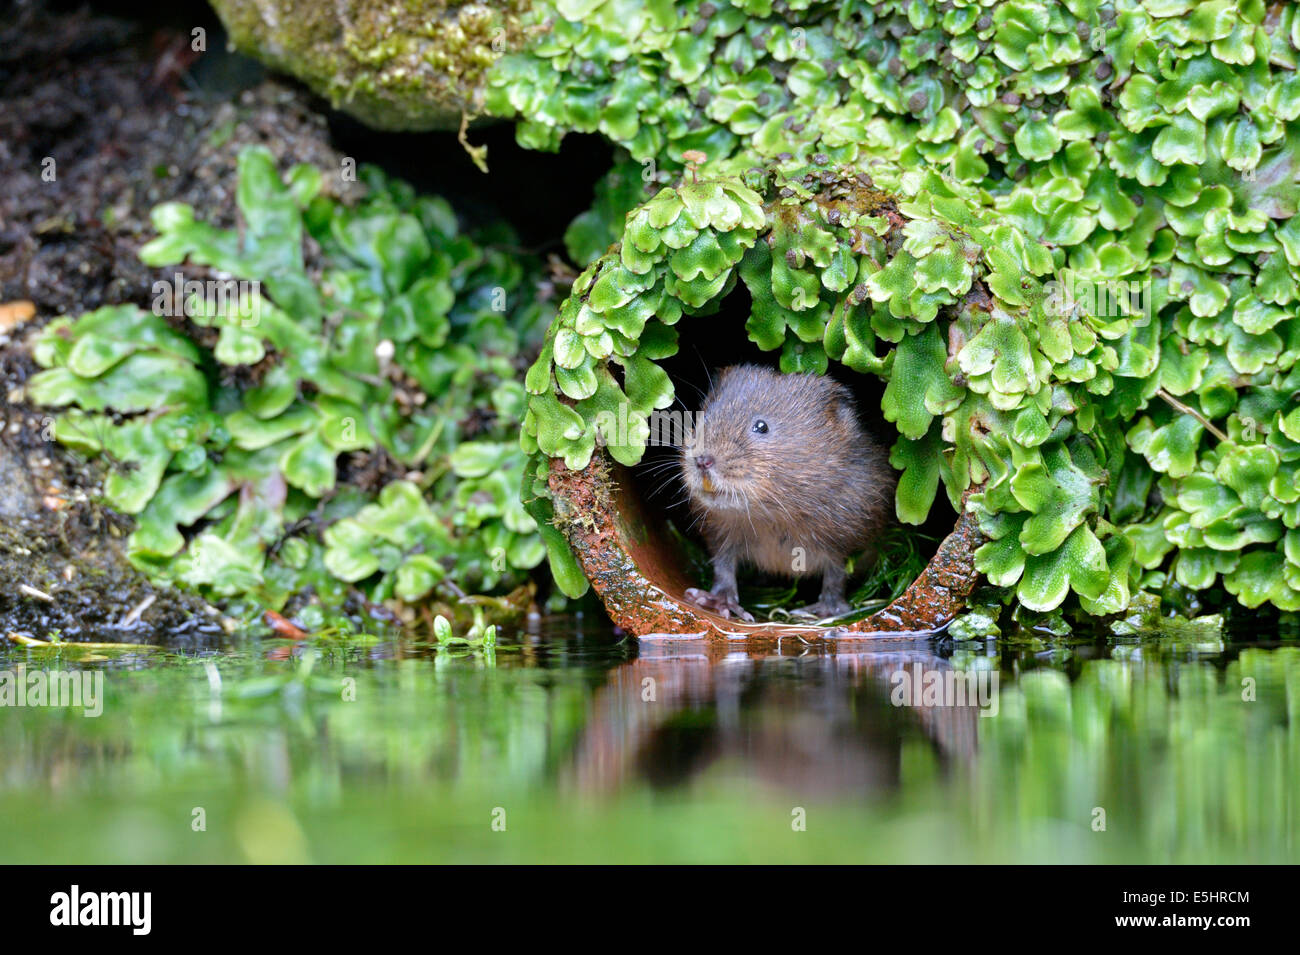 Water vole (Arvicola amphibius), UK - Stock Image